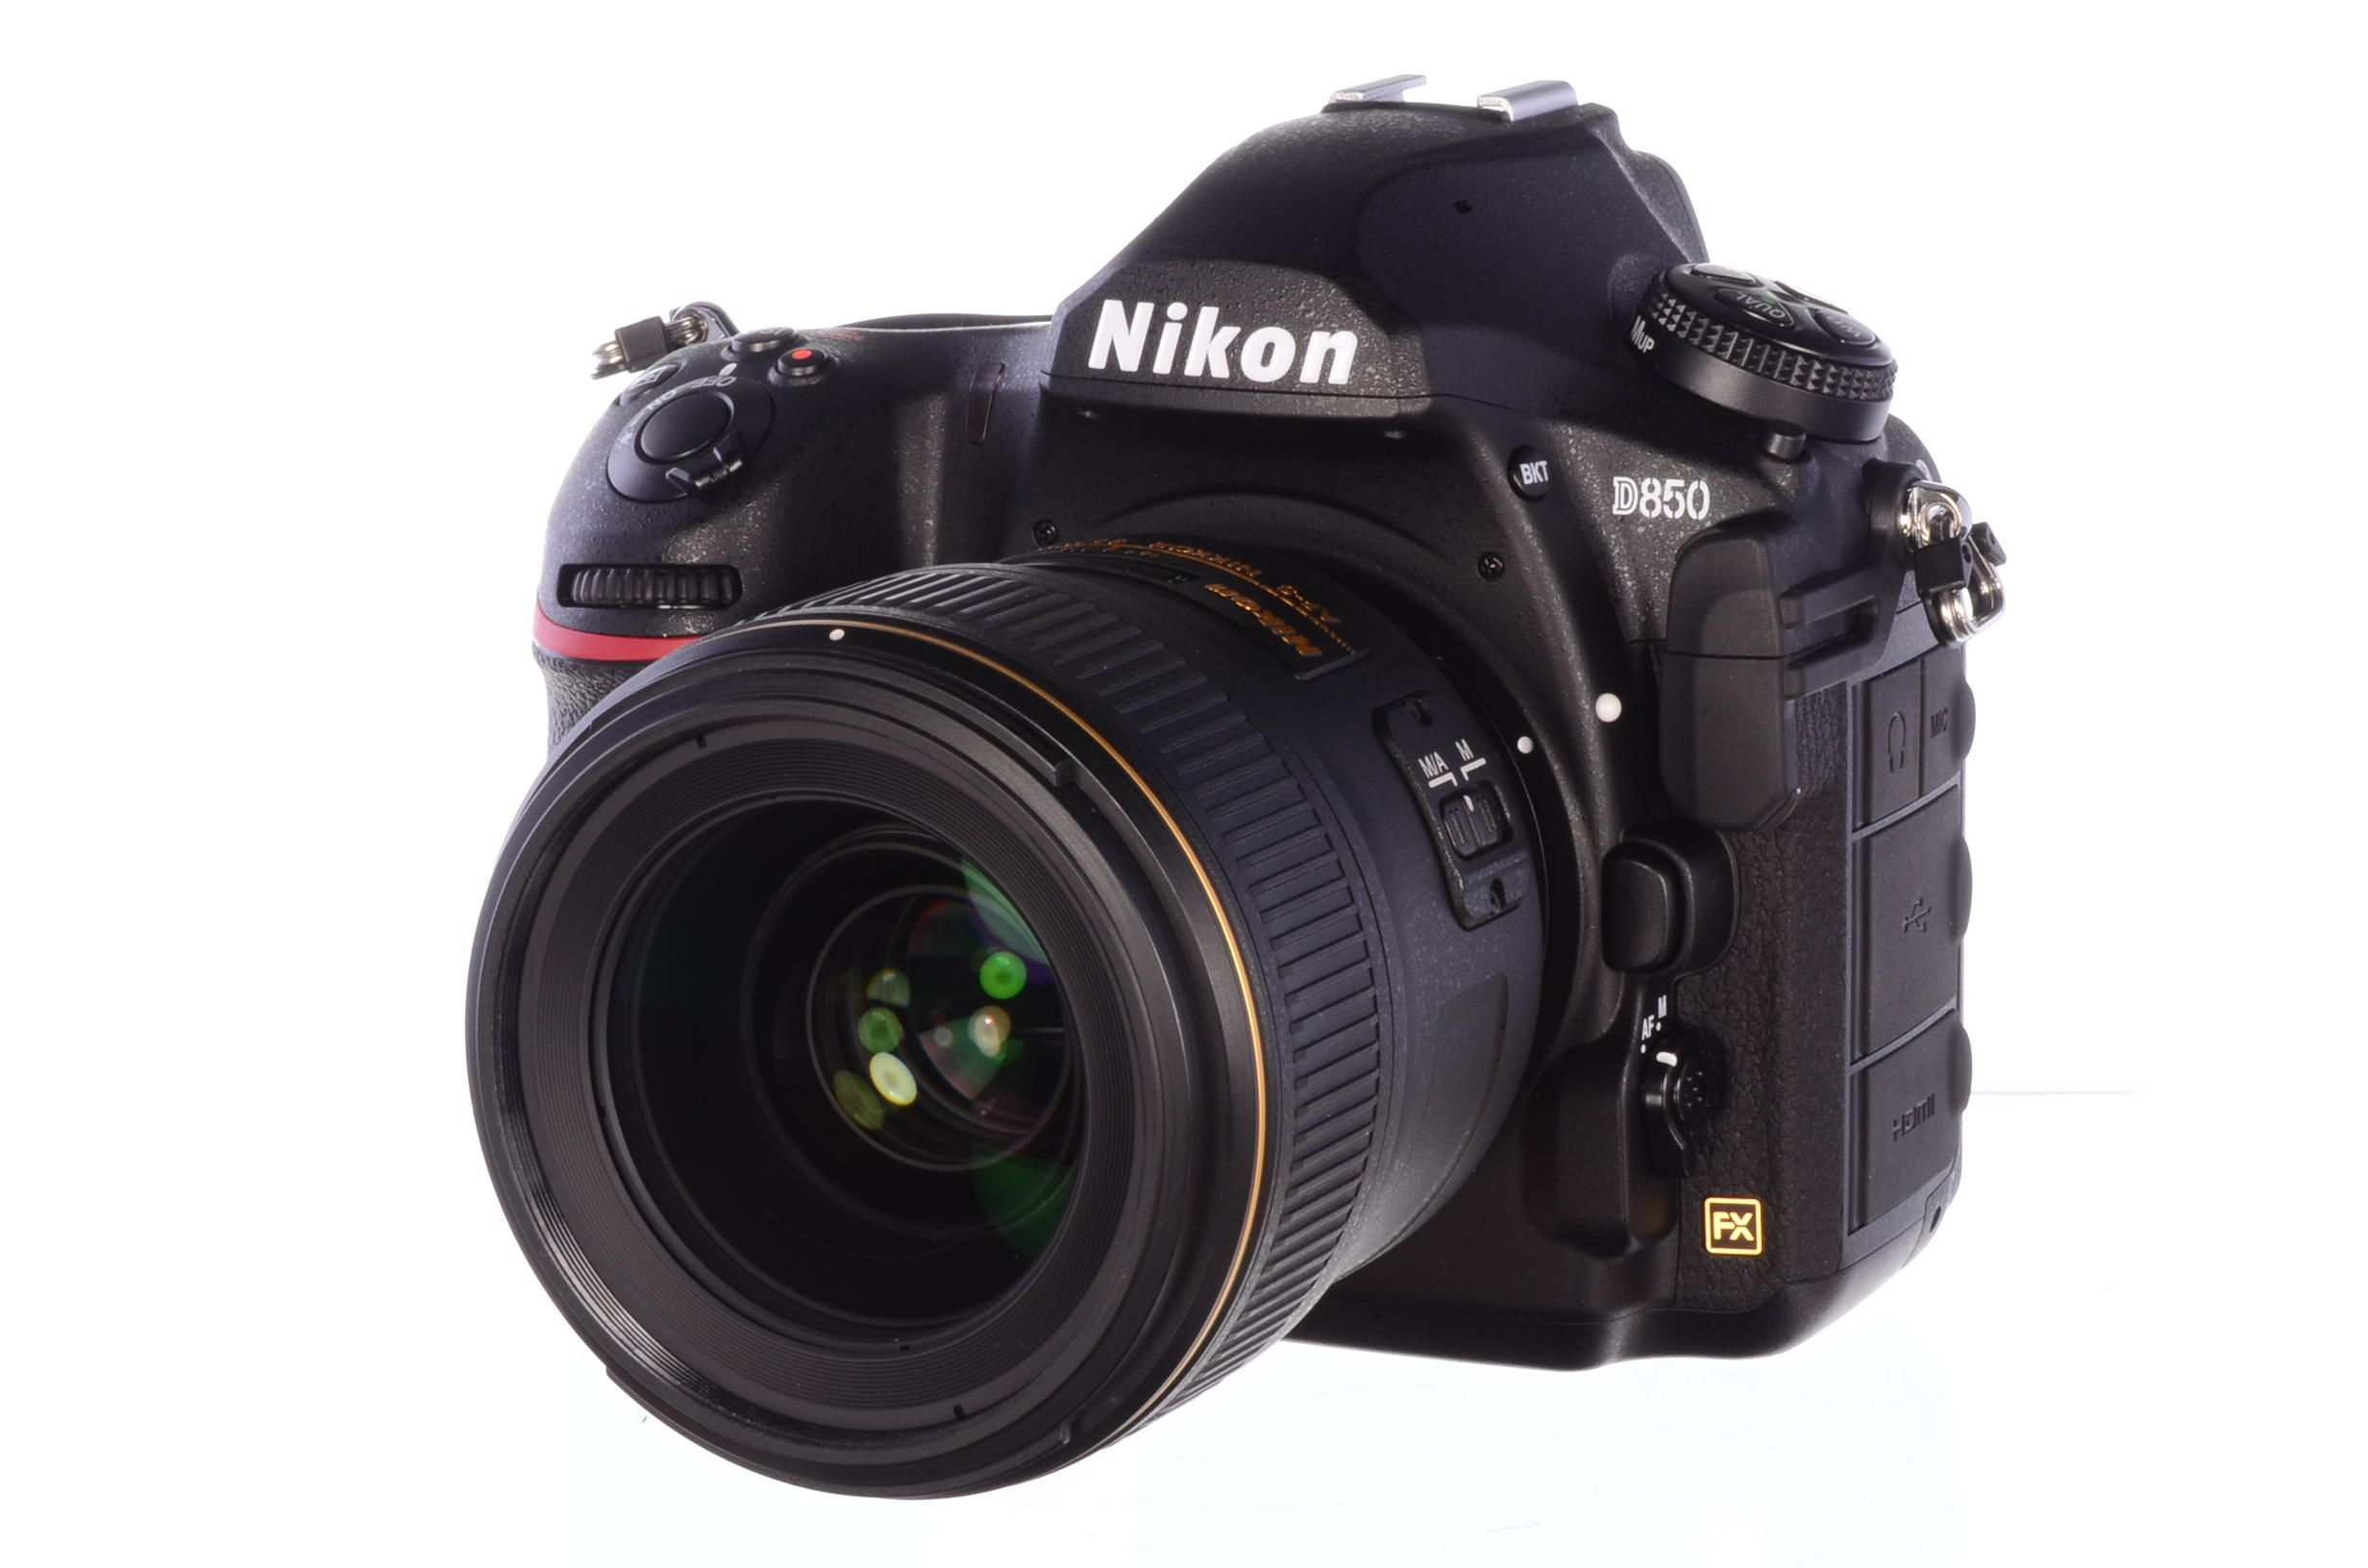 Nikon D850 With Stunning 35mm F1 4 Lens Photography Equipment Nikon D850 Leica